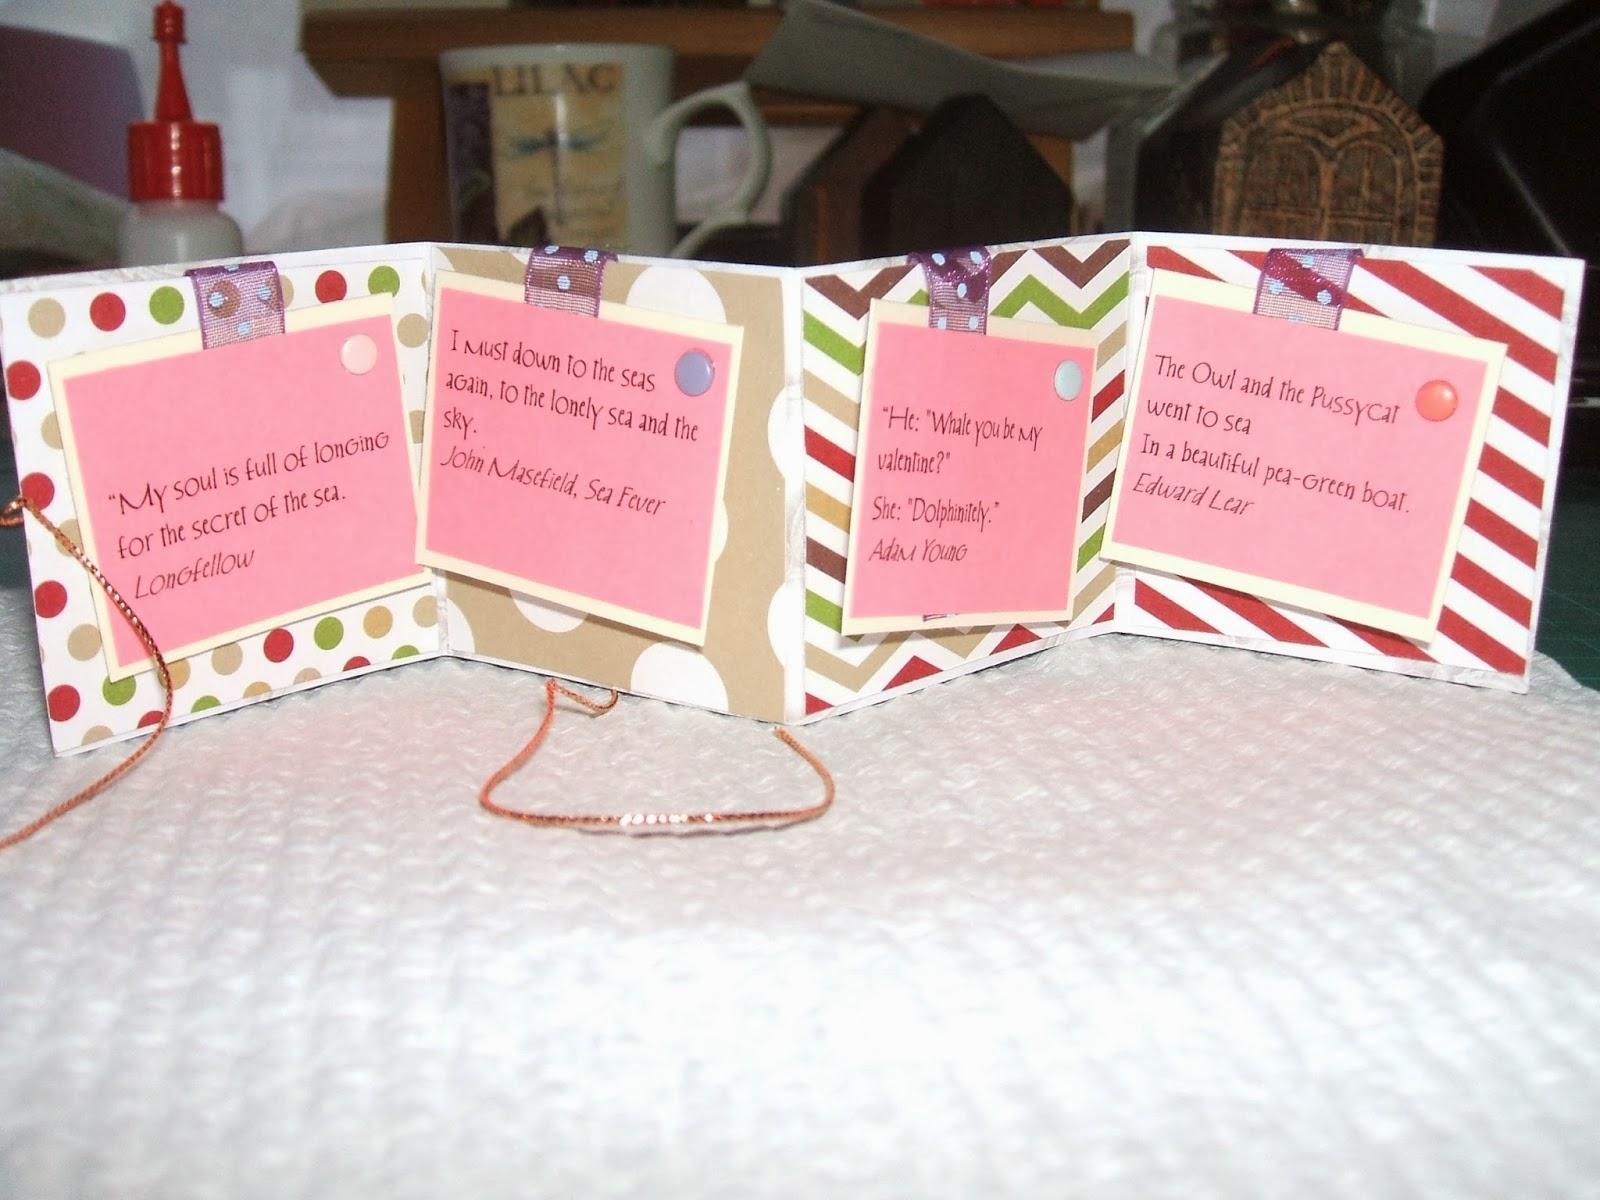 Robin Sparrow Books: International mini book swap: Our theme this ...